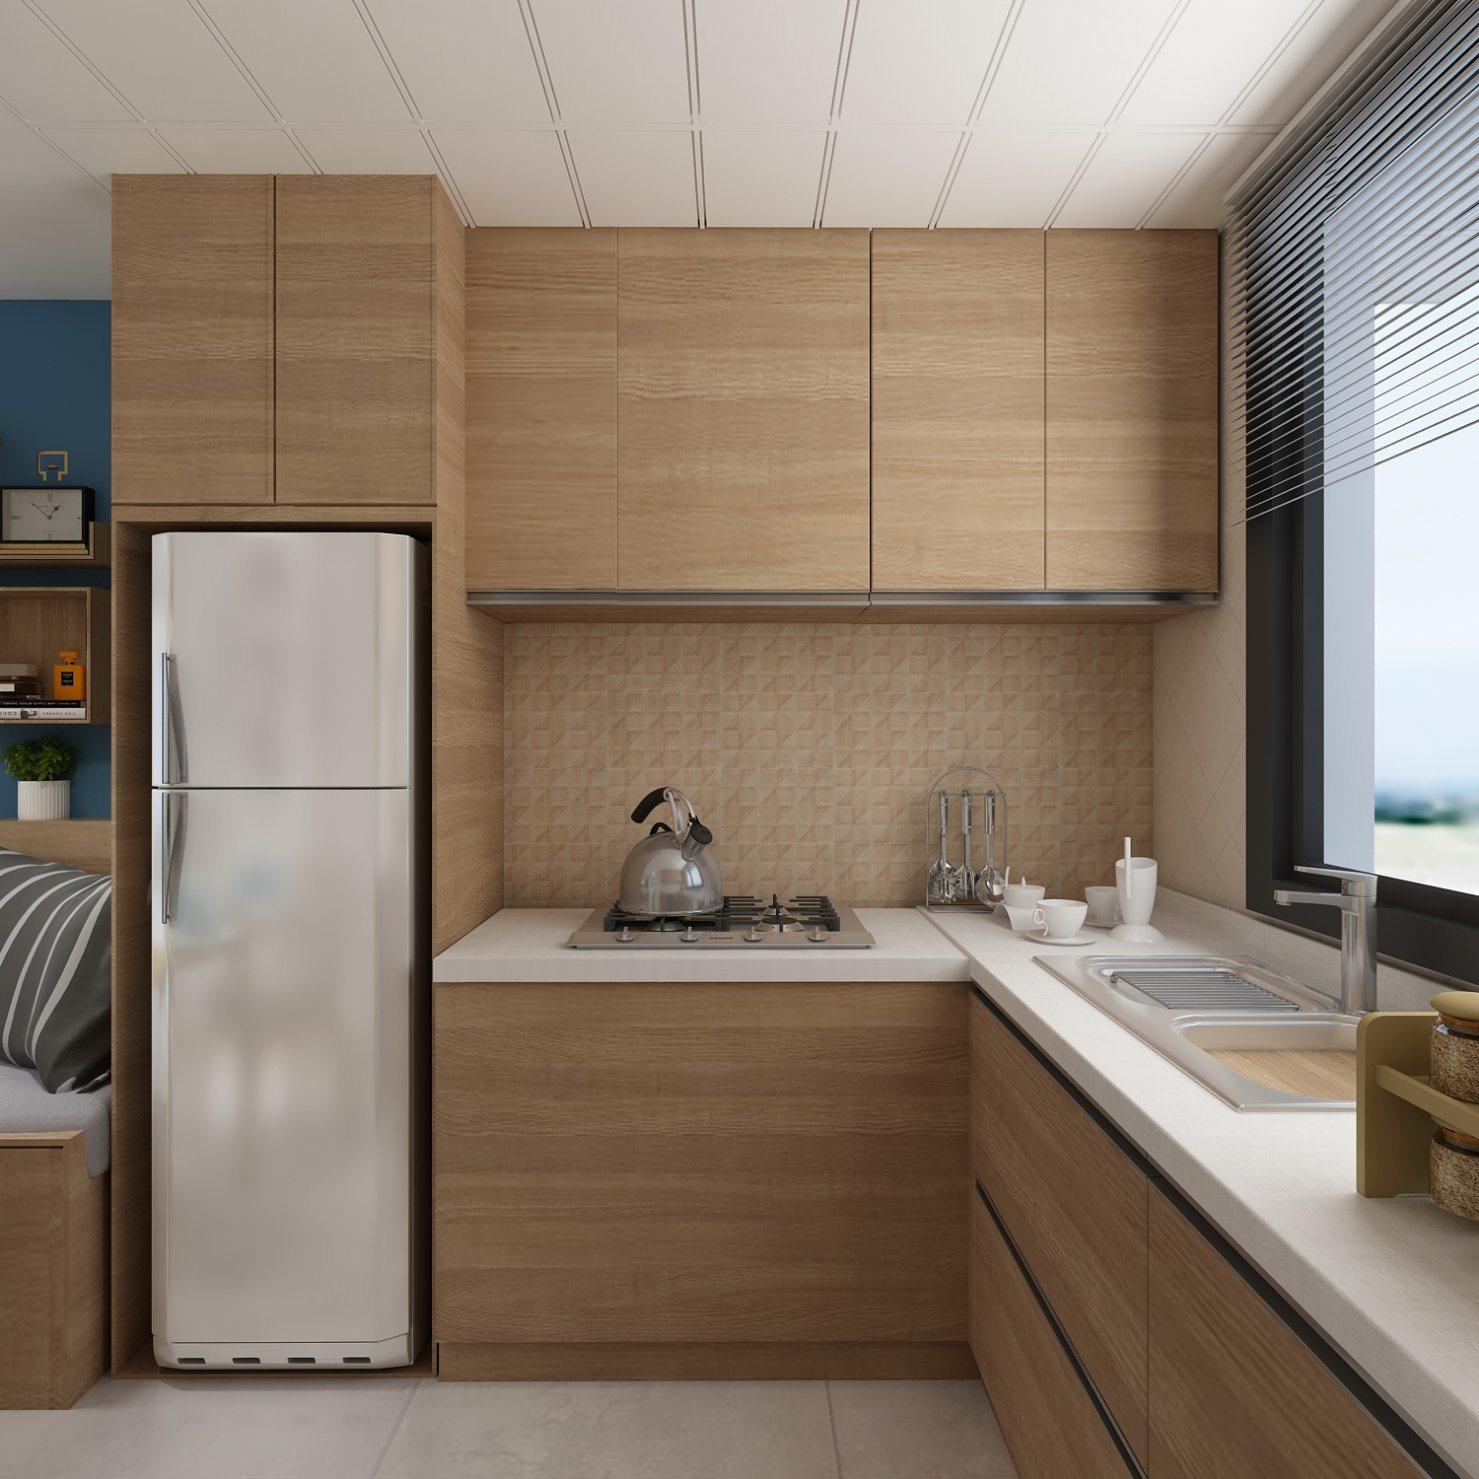 China 8x12 Inch Rectangle Ceramic Tile Kitchen Backsplash